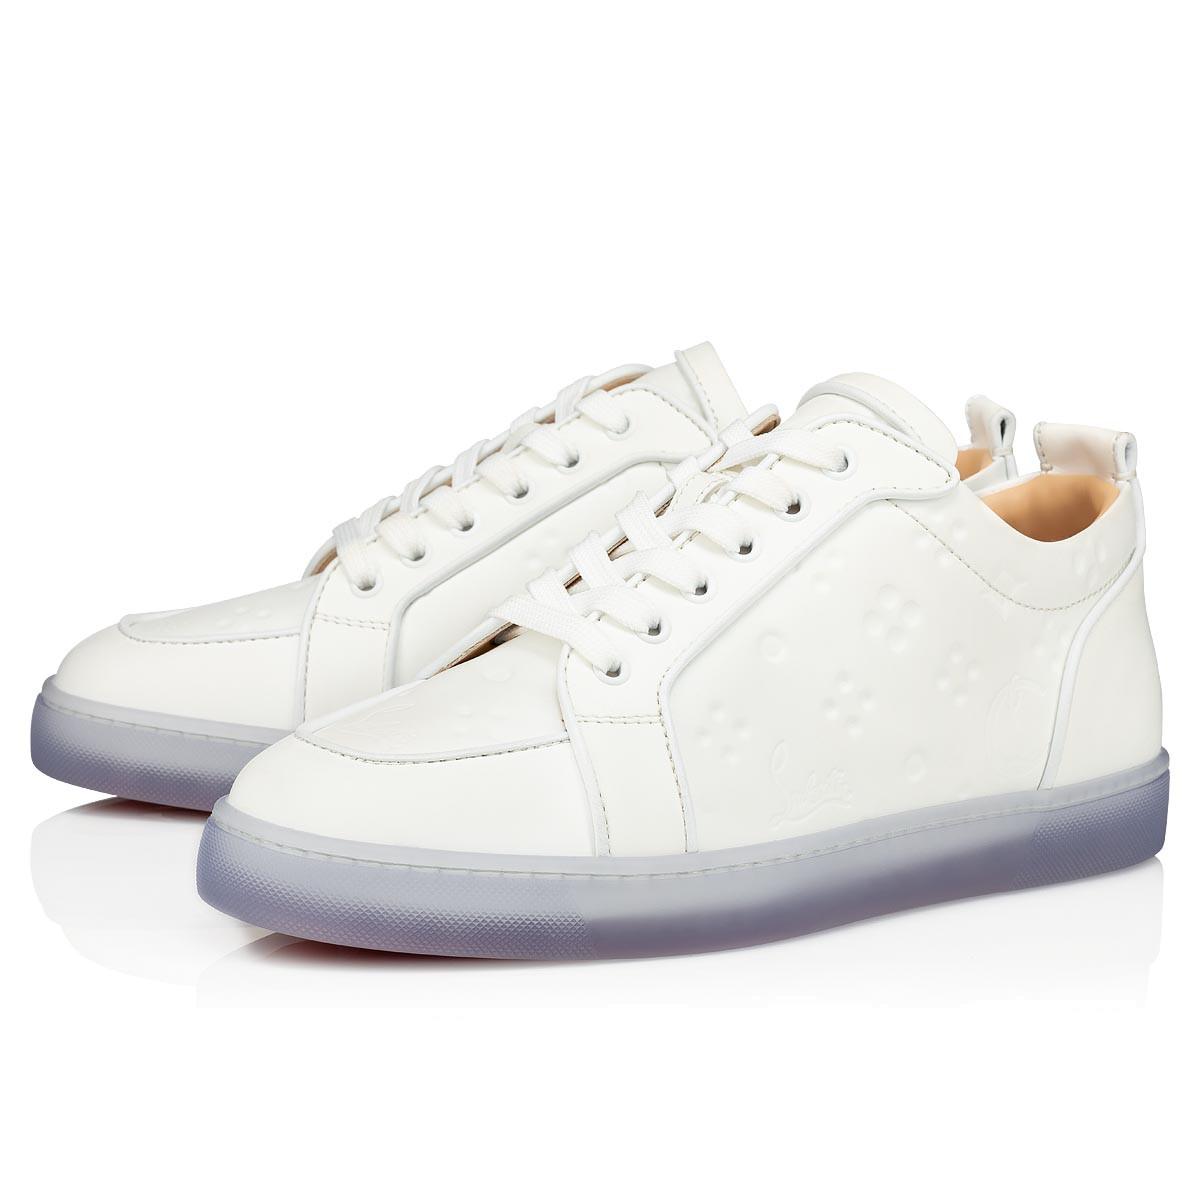 Christian Louboutin Rantulow Orlato Satin Chaussures